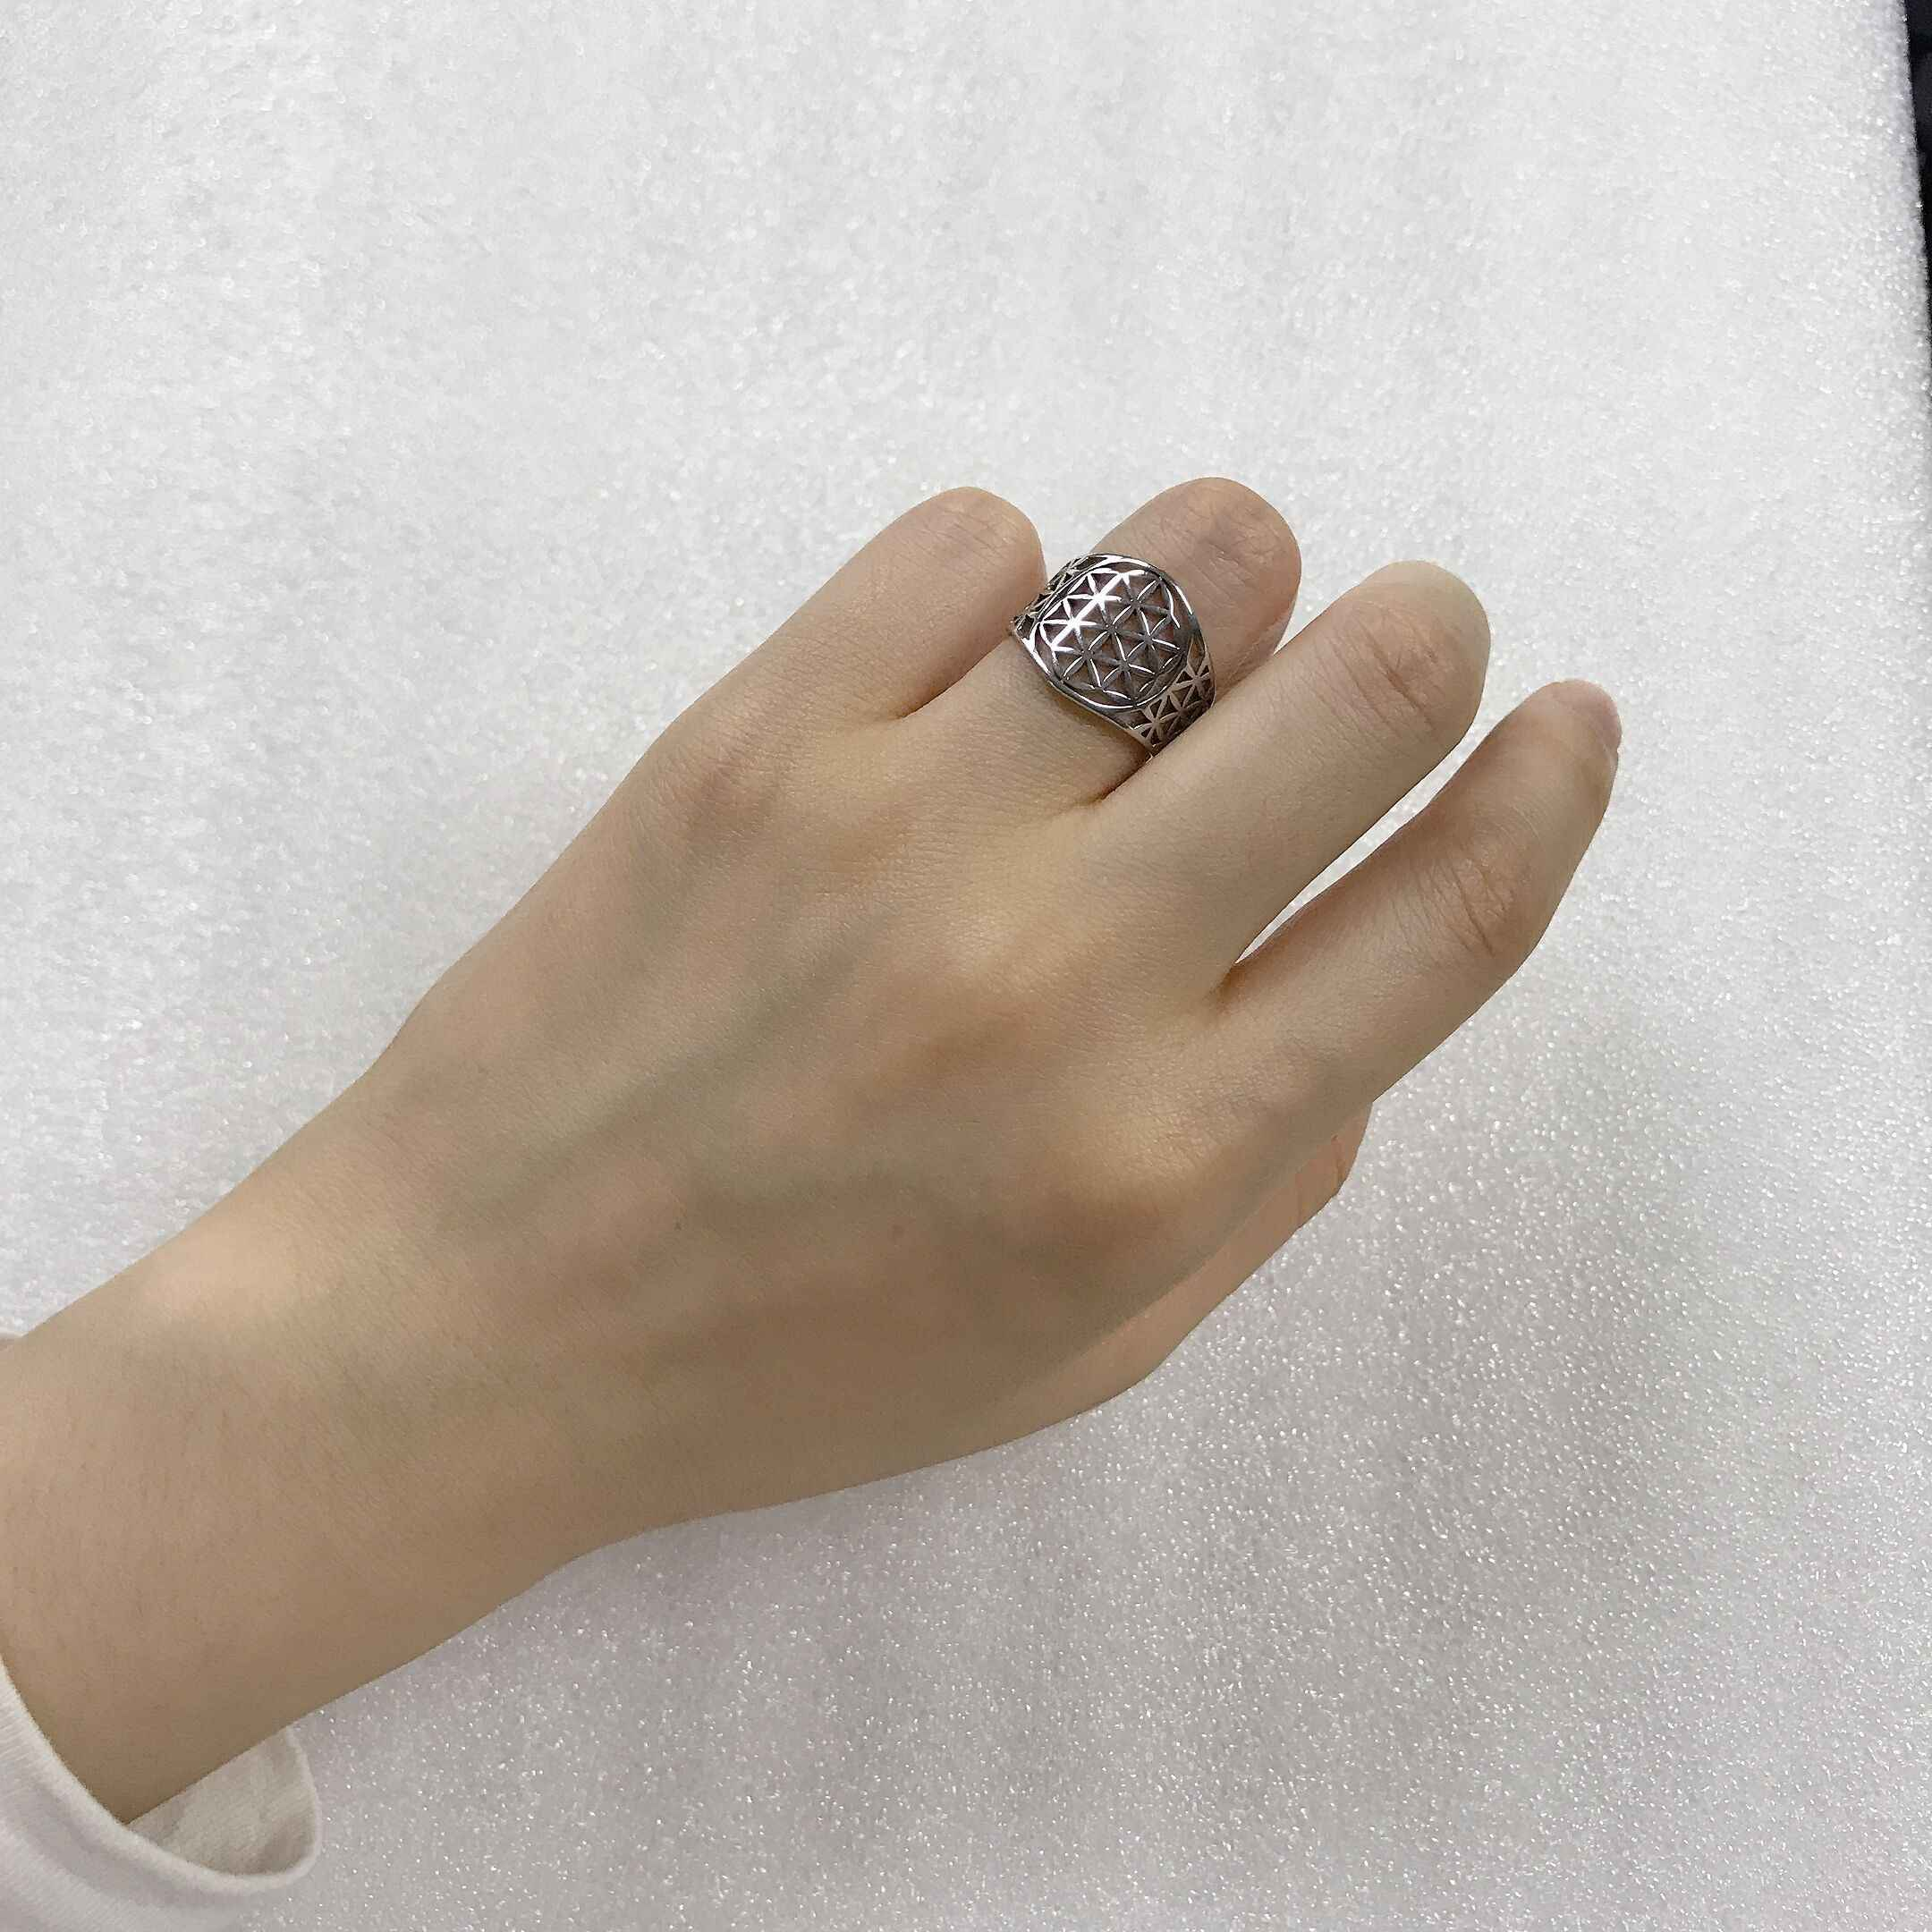 Uniftแปลกสไตล์Openworkดอกไม้ชีวิตแหวนสแตนเลสTrendy Wiccaเครื่องประดับสำหรับสตรี